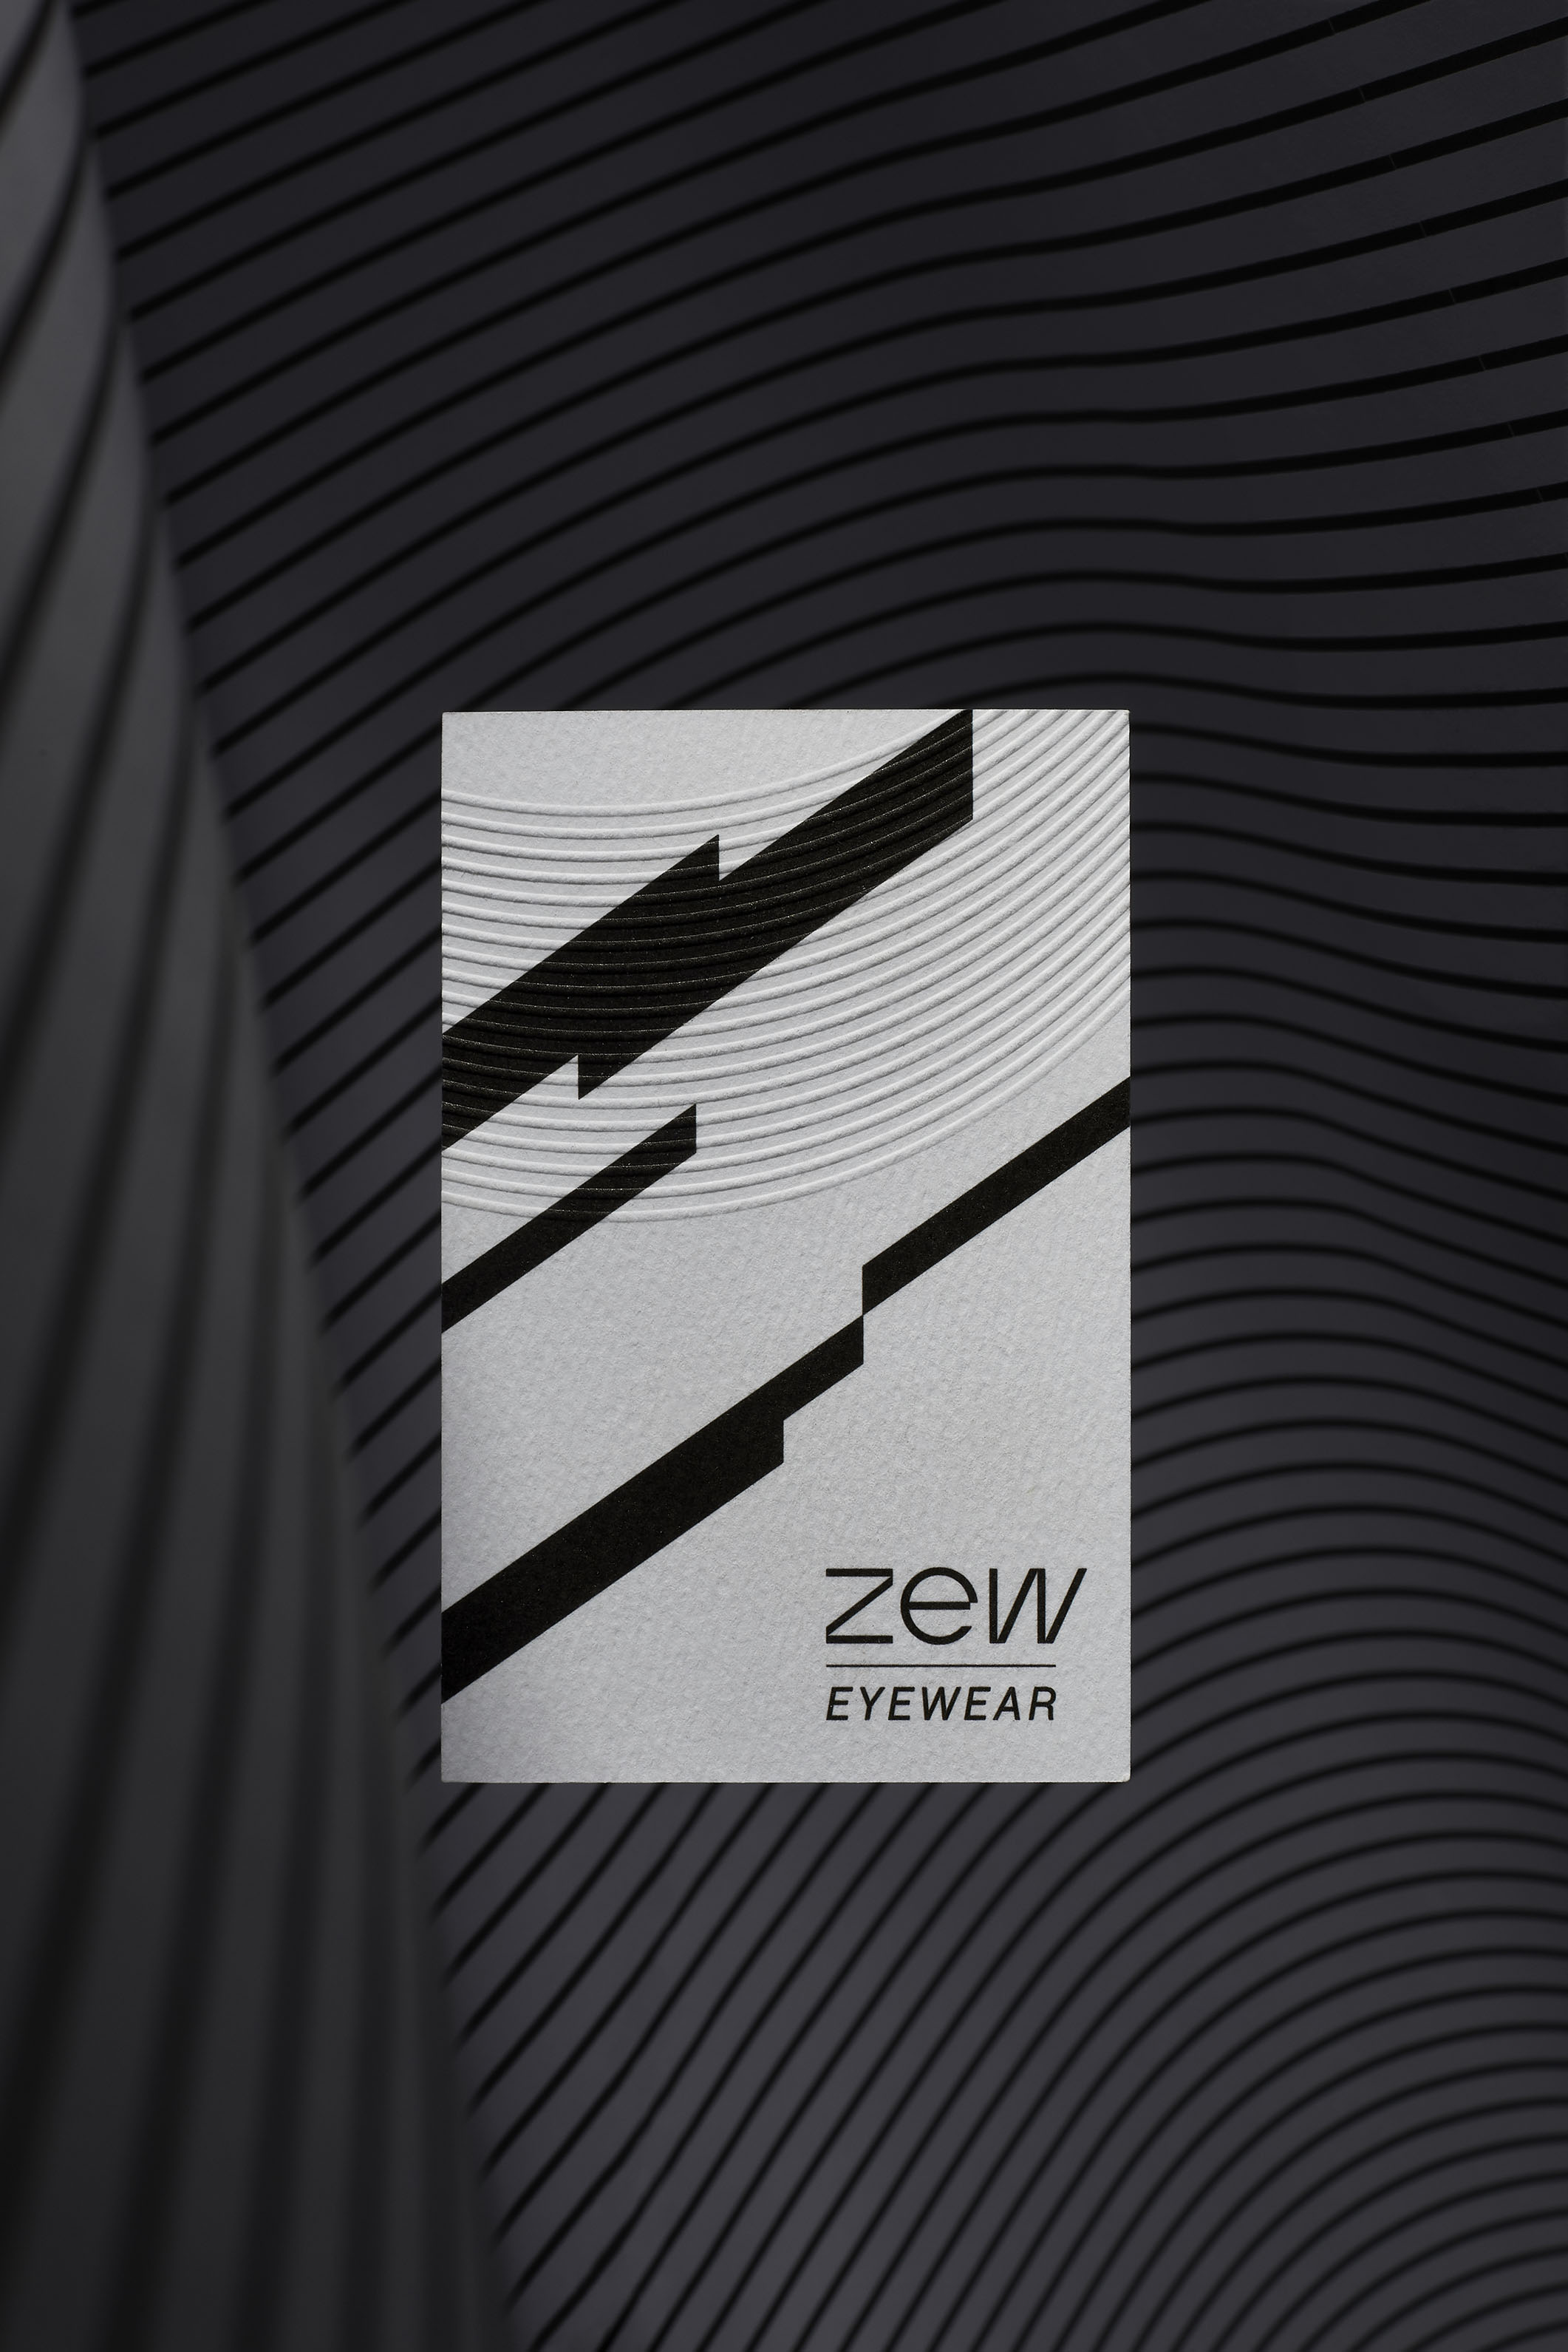 ZEW_Veronika_Rut_Novakova_Design_09